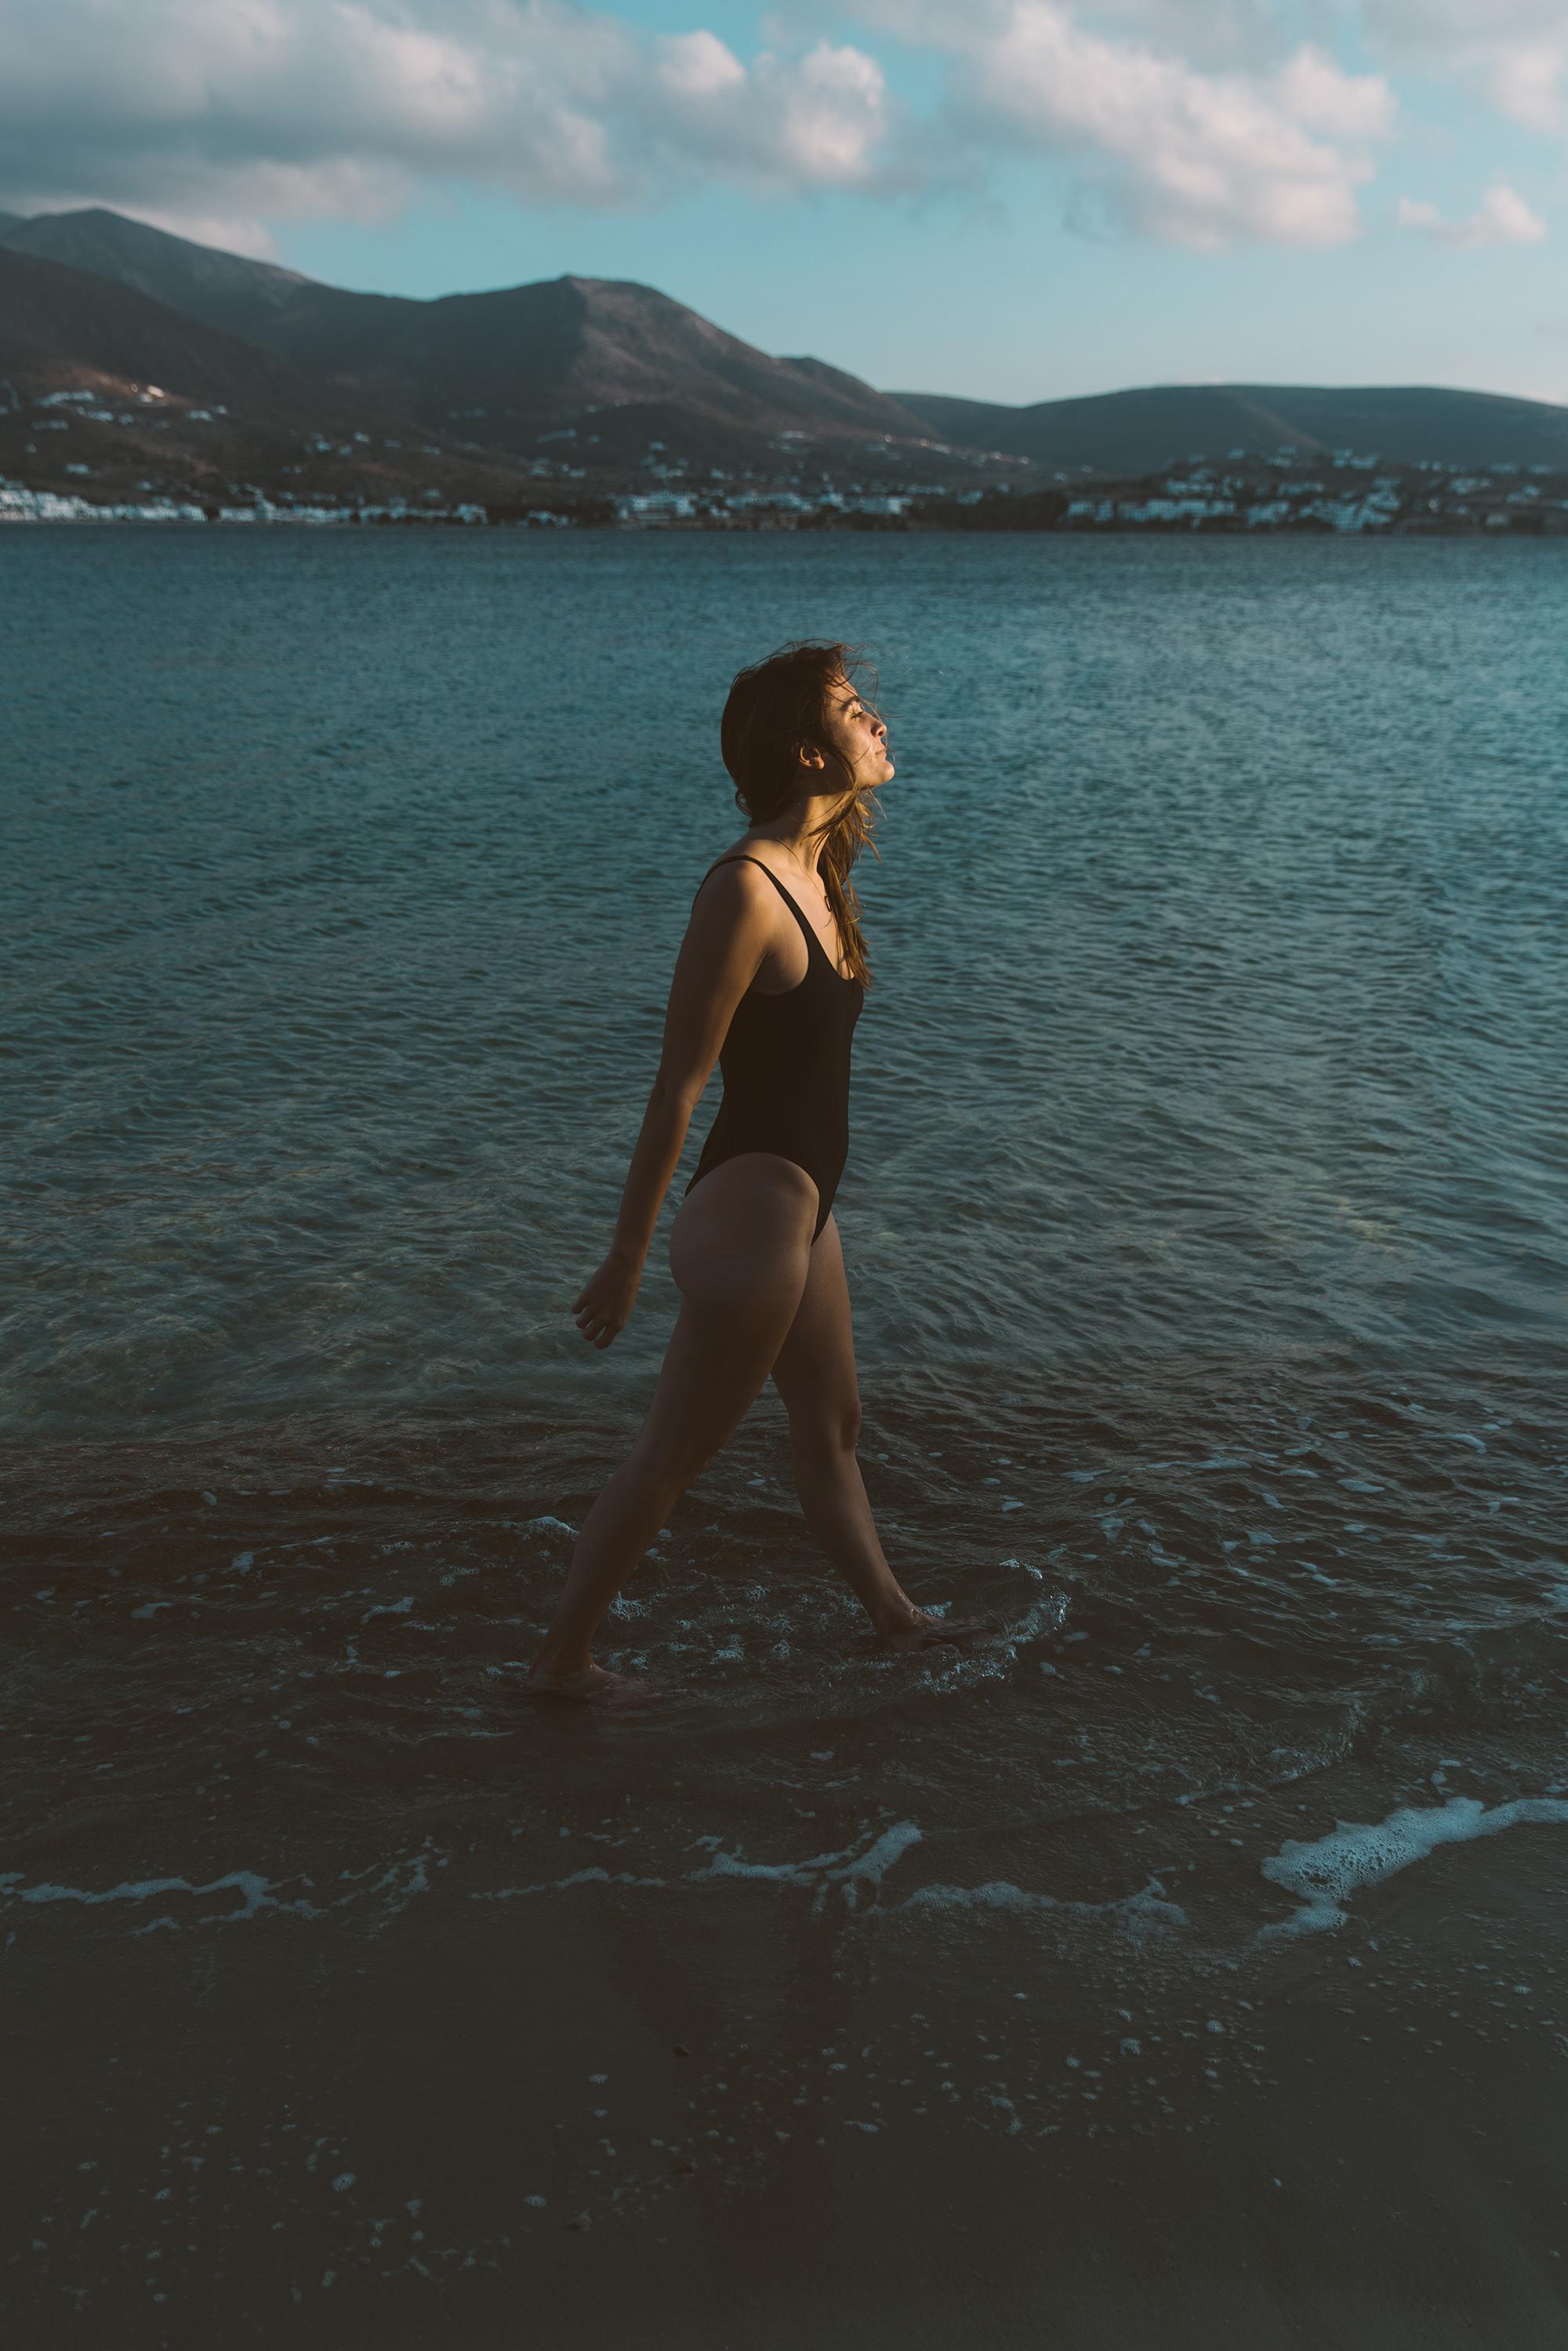 sarah-hirning-paros-island-greece-aegean-sea-sunset-golden-hour-swimsuit-beach-sand.jpg